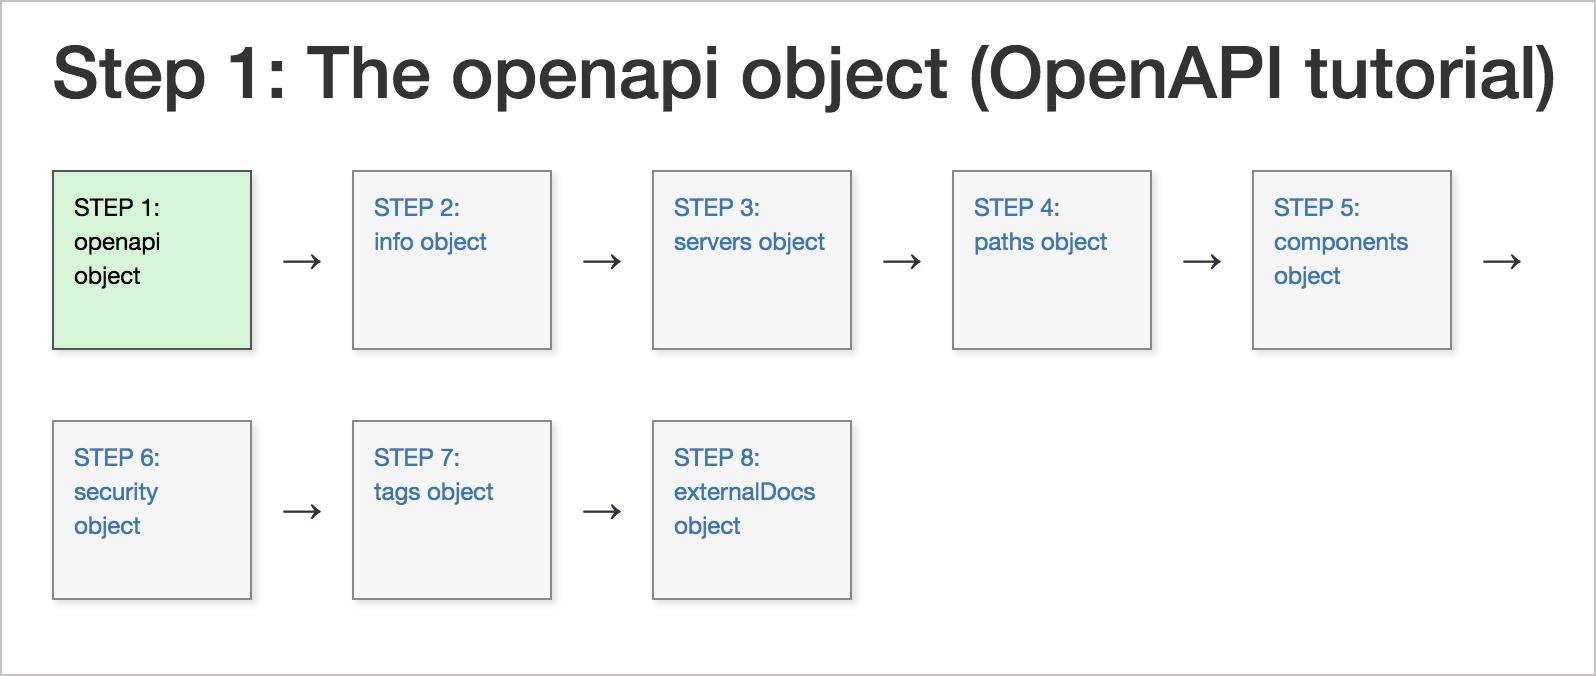 OpenAPI tutorial